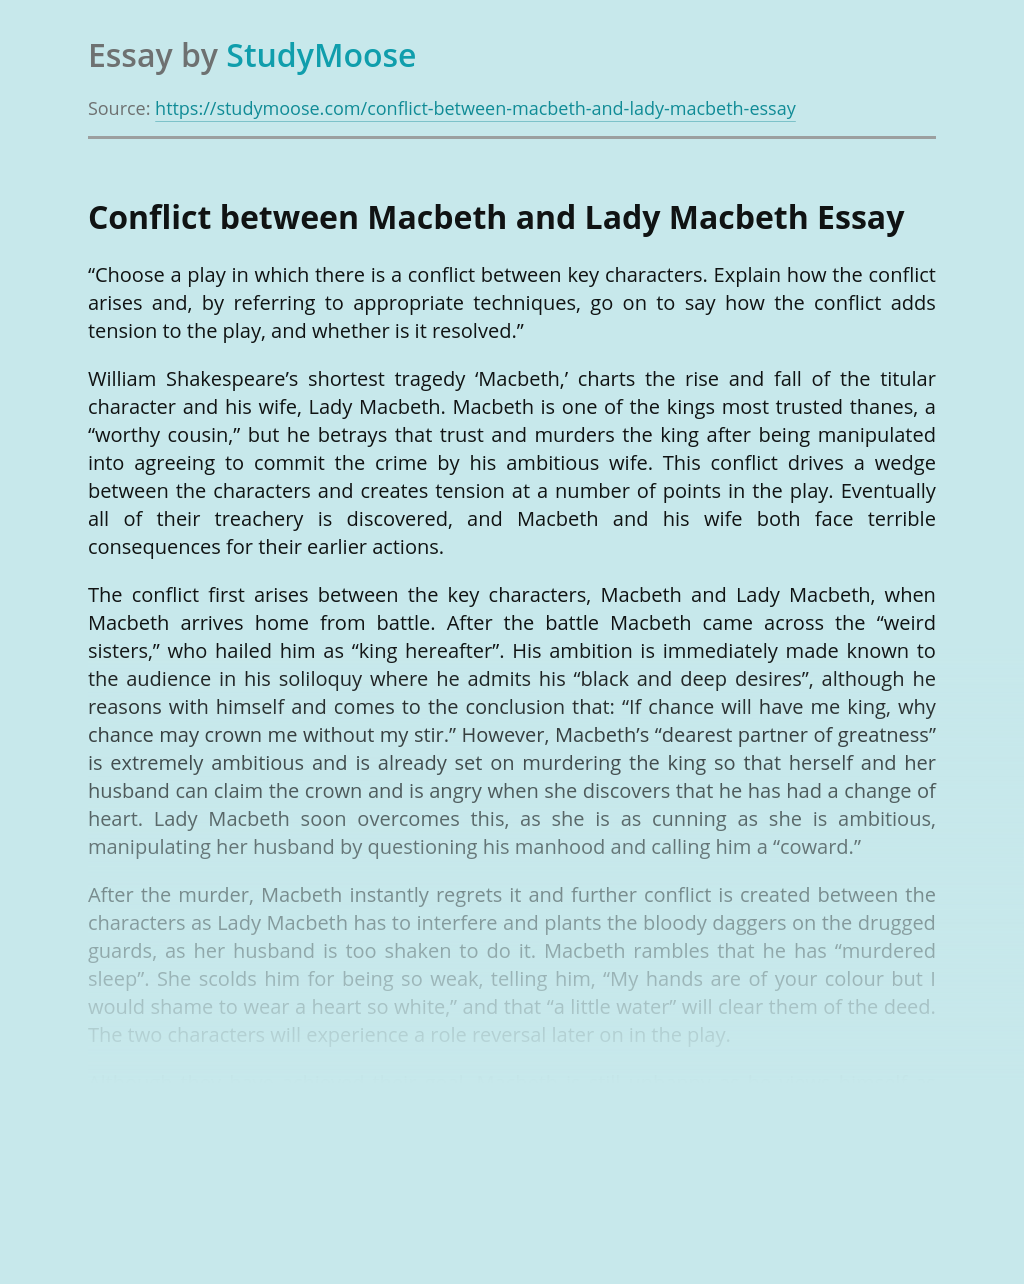 Conflict between Macbeth and Lady Macbeth